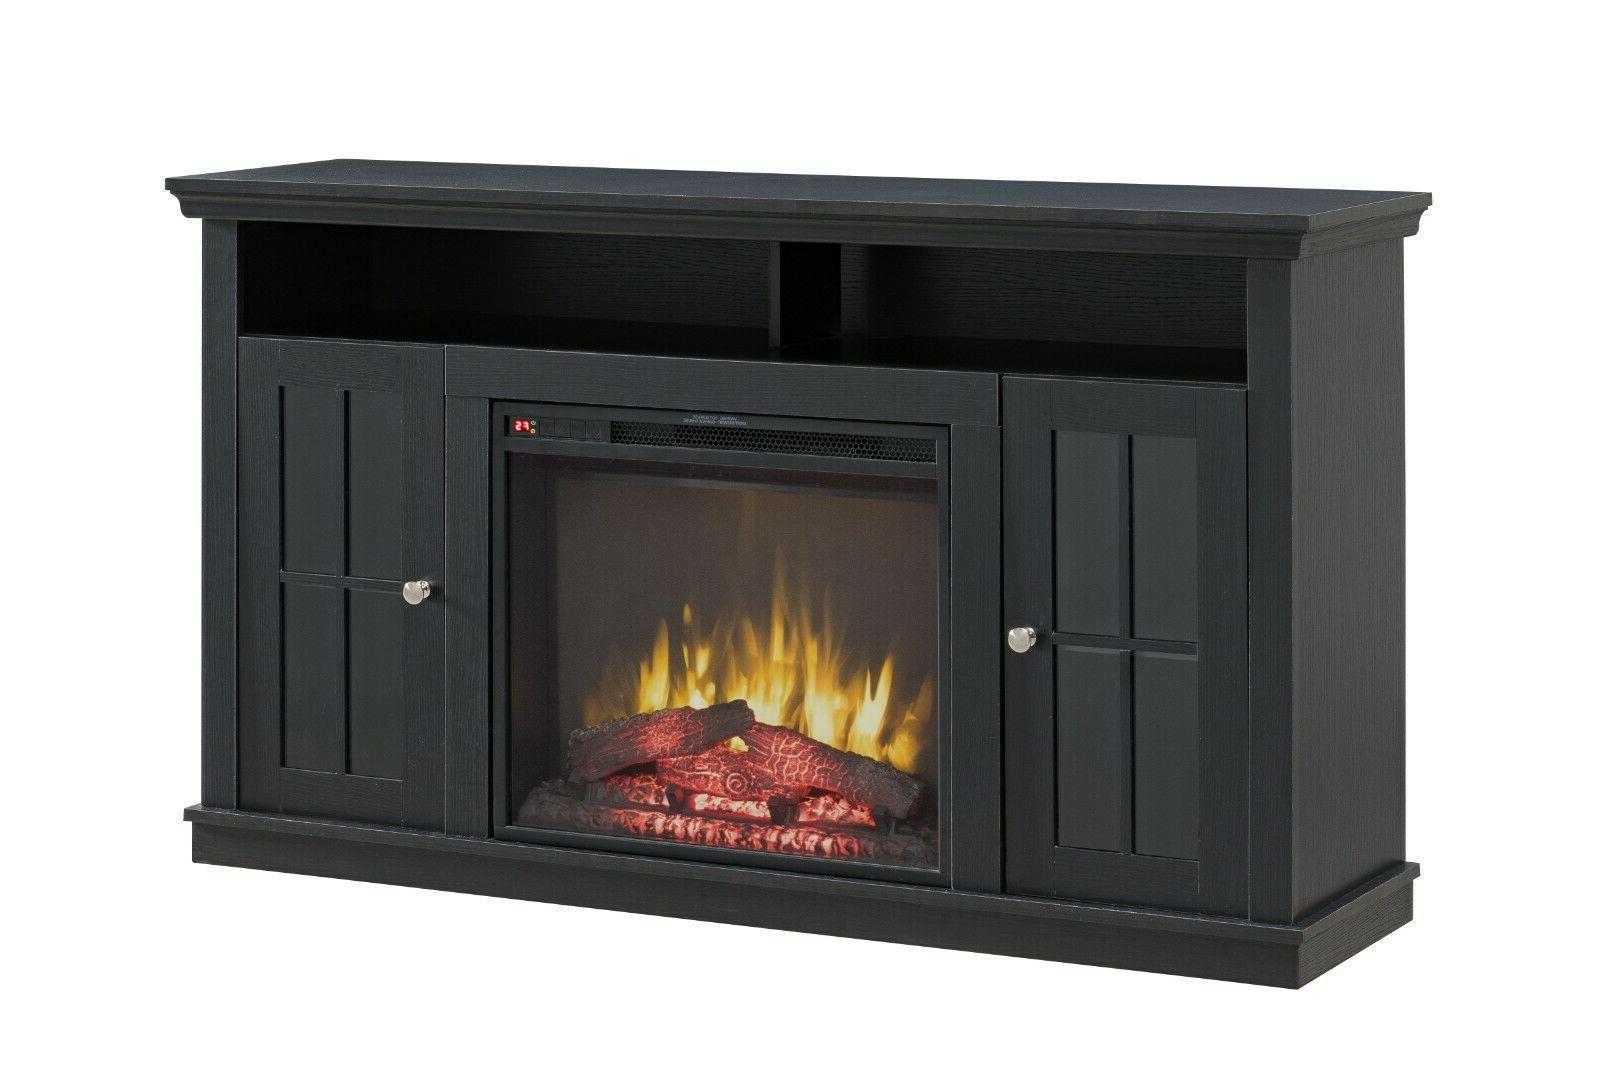 Modern Black Heat Fireplace Stand Unit Fits Tv